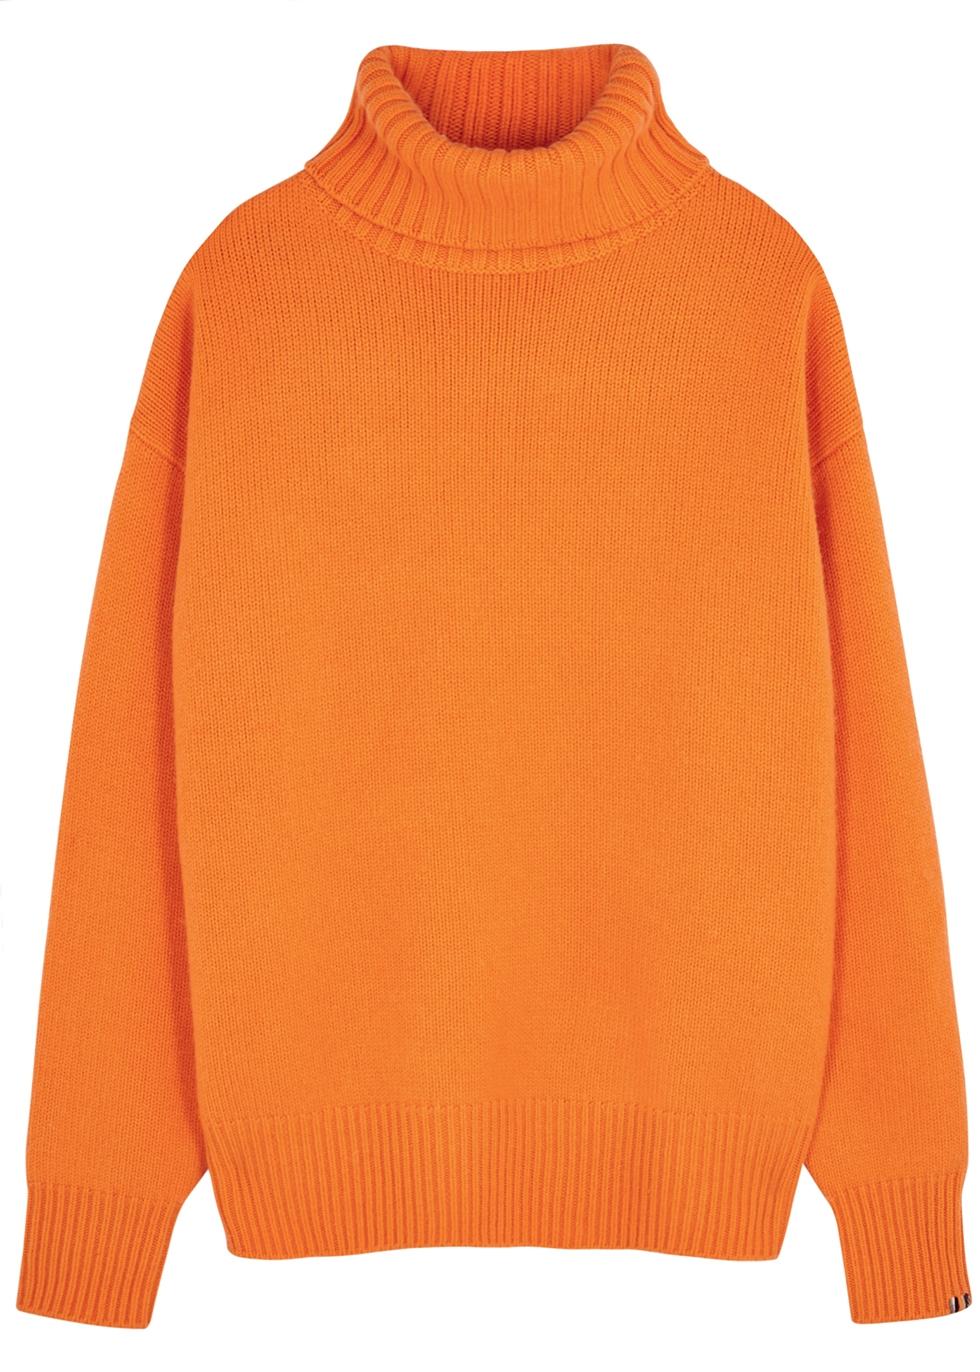 Women's Designer Knitwear and Jumpers Harvey Nichols